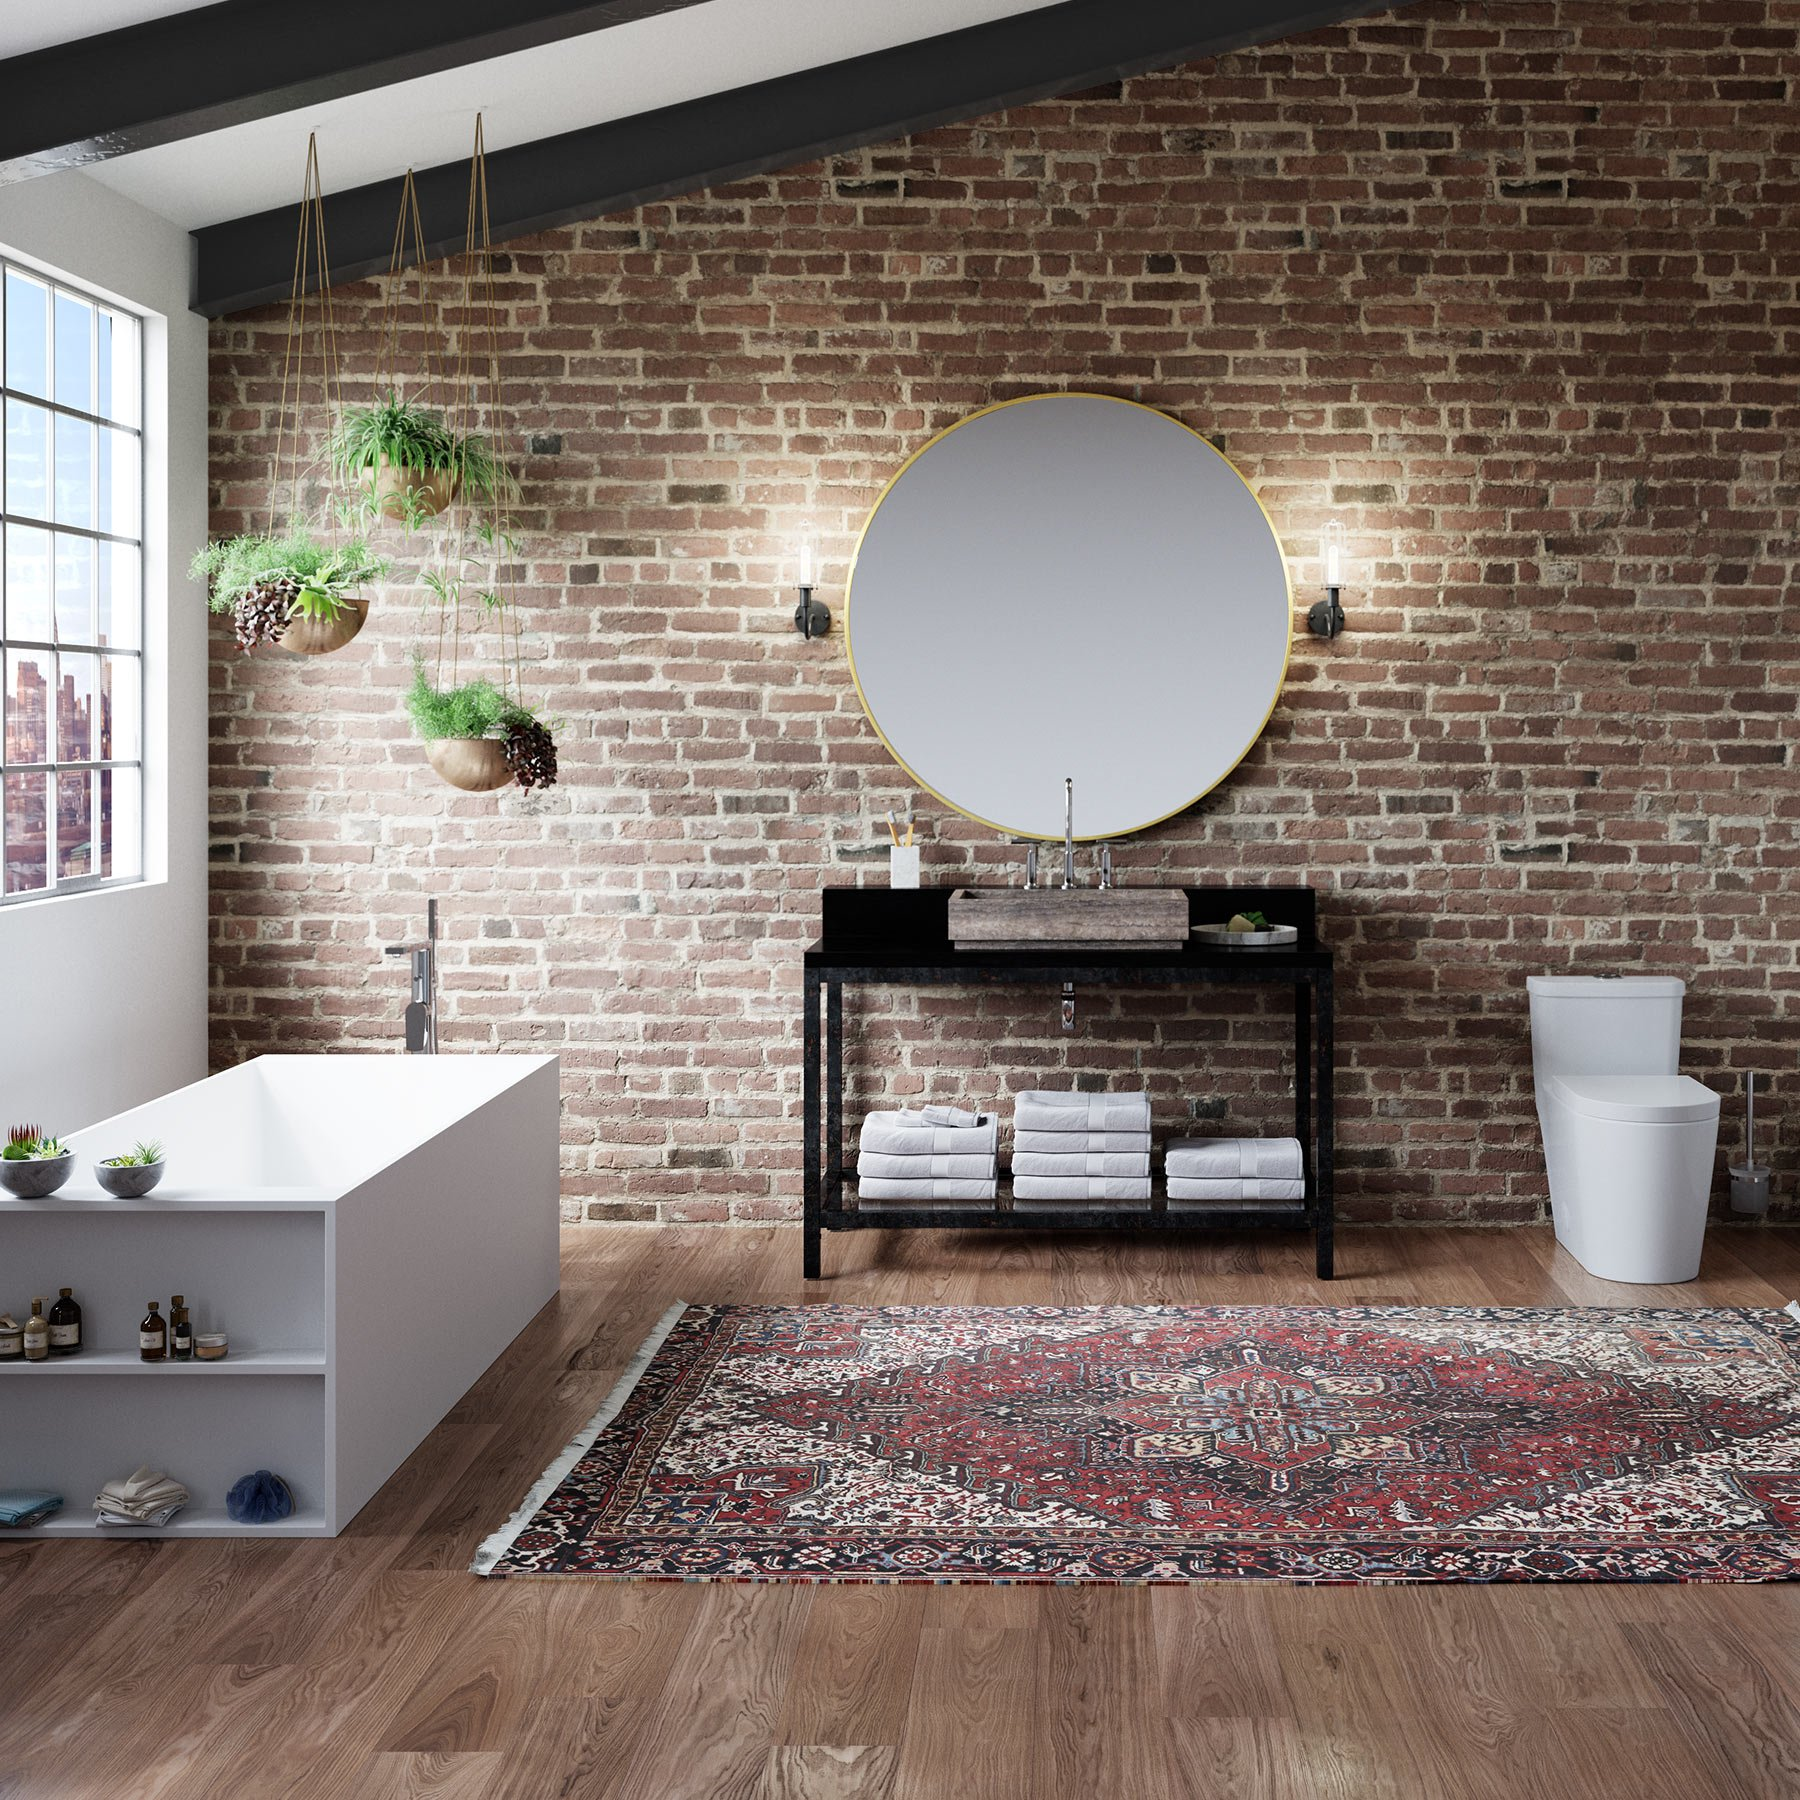 MAYKKE 18 Sq Ft Reclaimed Pecan Luxury Vinyl Interlocking Plank Flooring 48x7 inch | Resembles Hardwood | (Pack of 8) Easy Install in Your Kitchen, Bathroom, Hallway, Living Room | JHA1020101